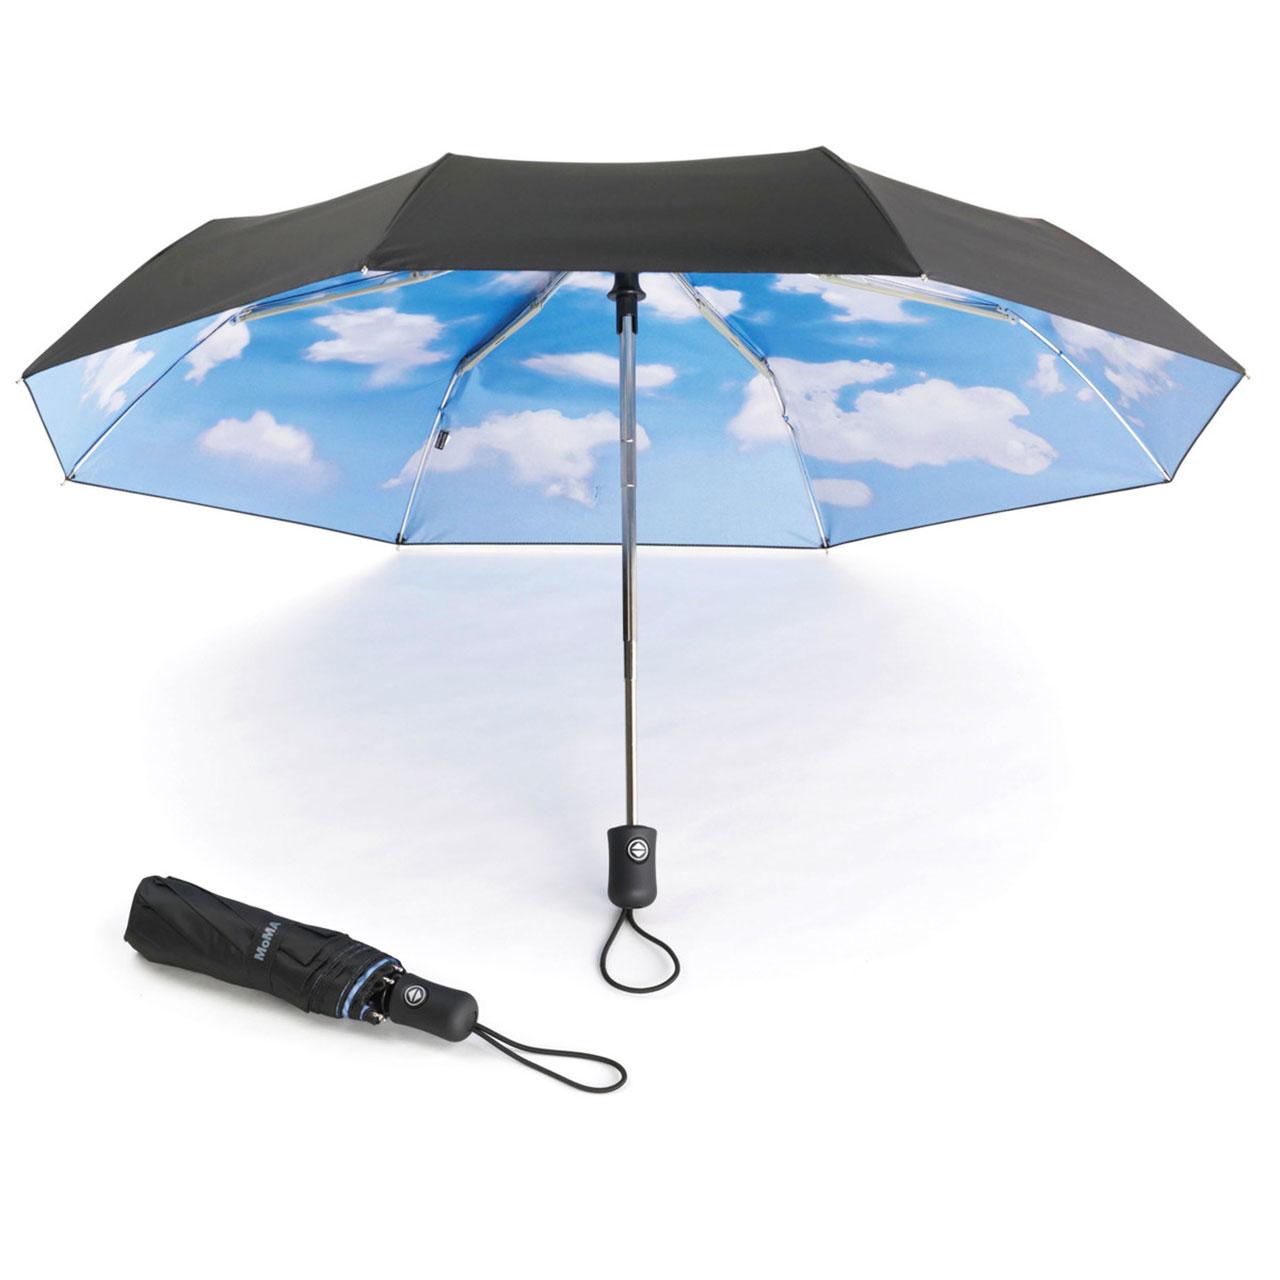 MoMa Sky Umbrella Collapsible | the design gift shop